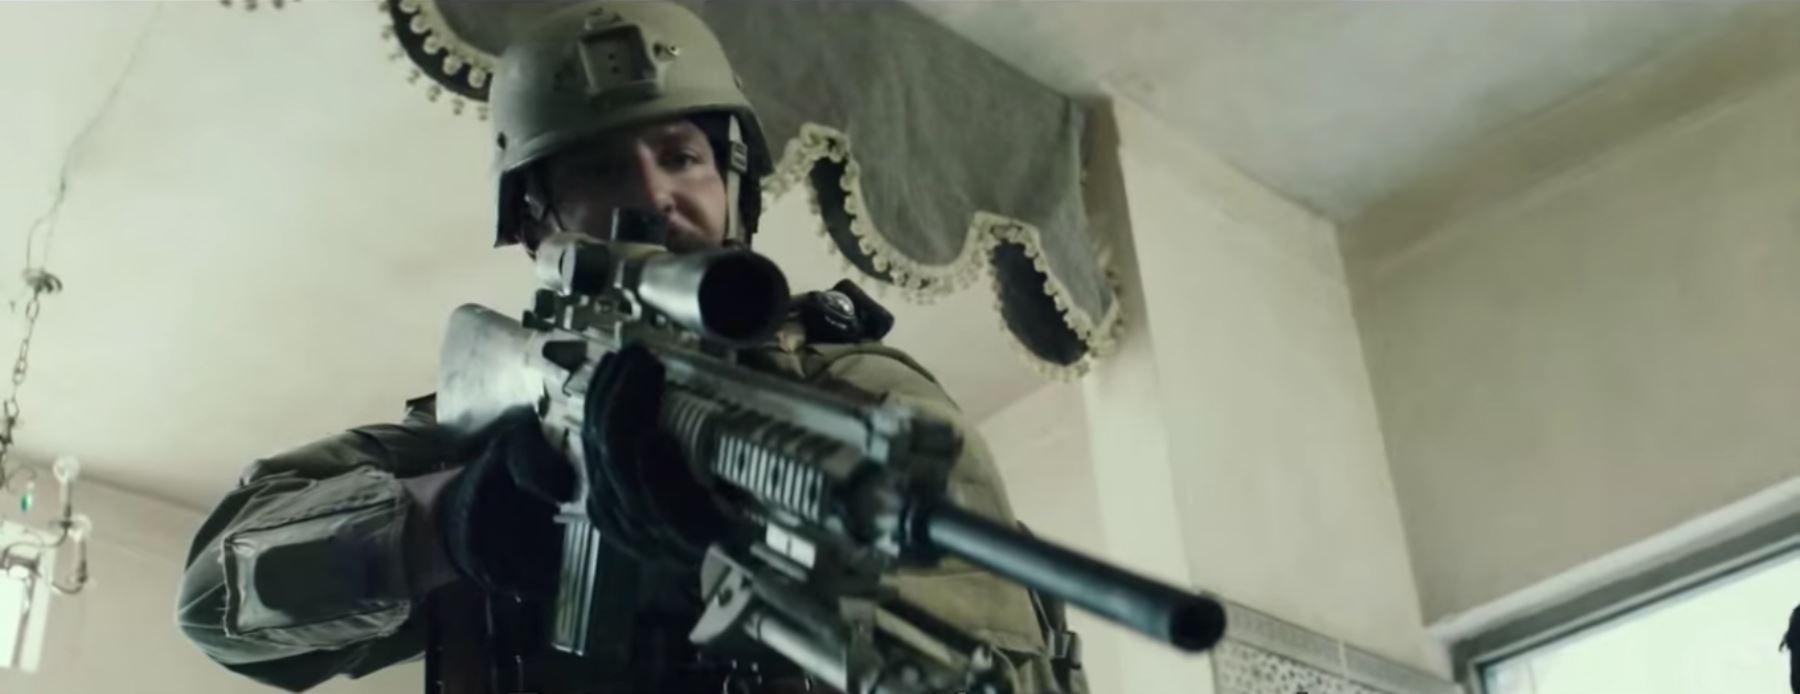 Escena de American Sniper, El francotirador